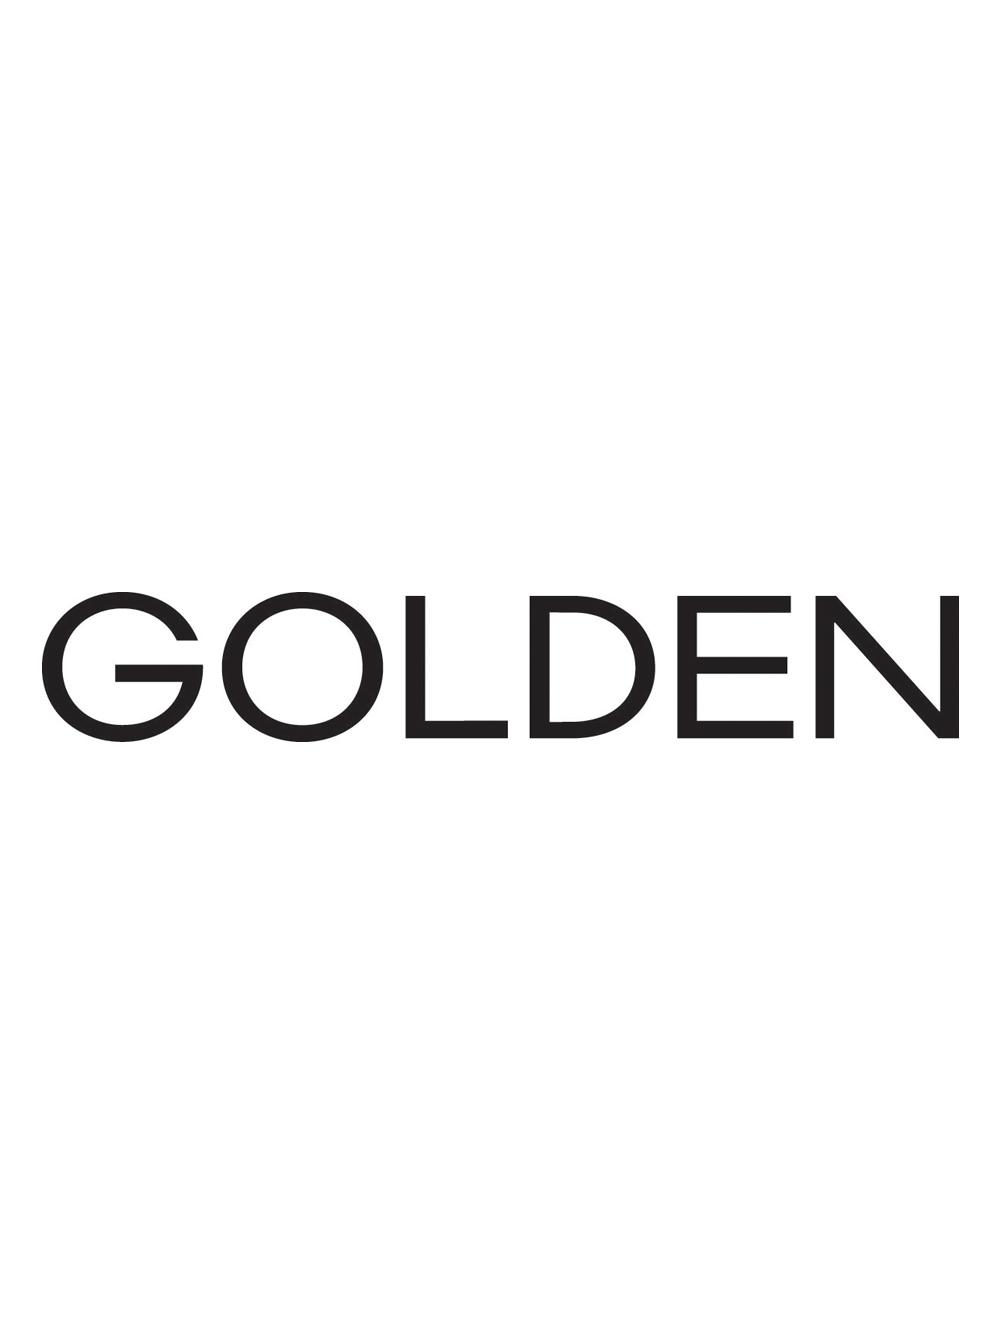 golden_1000x1333.png